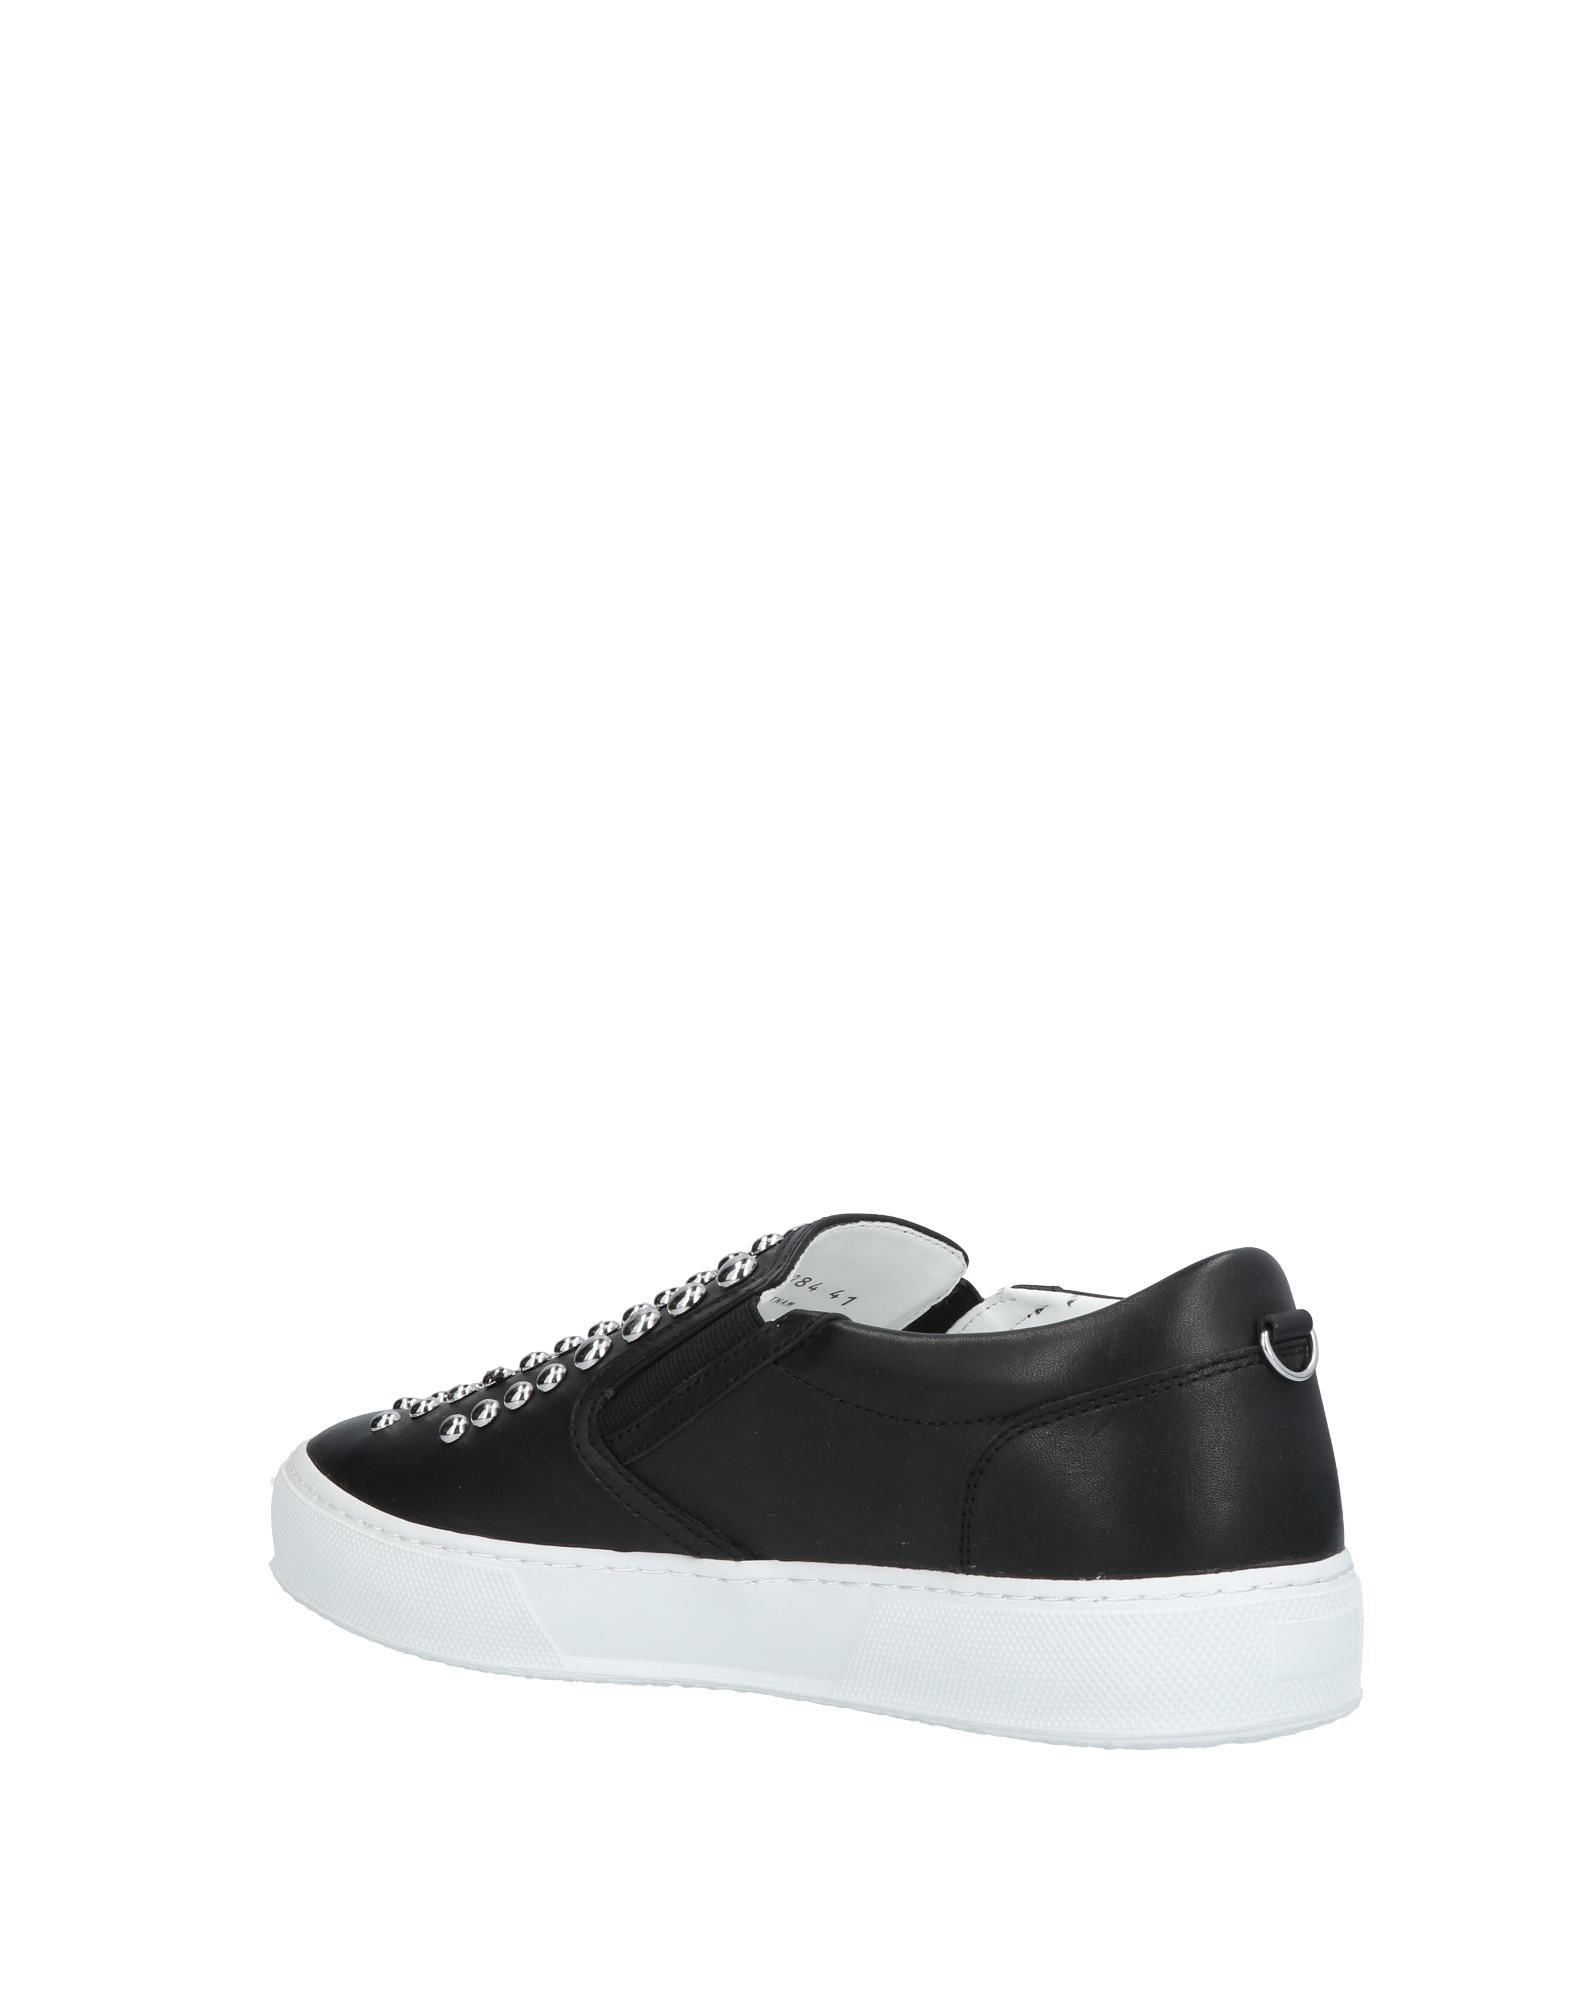 Cult Sneakers 11422025JE Herren  11422025JE Sneakers Heiße Schuhe 63fced